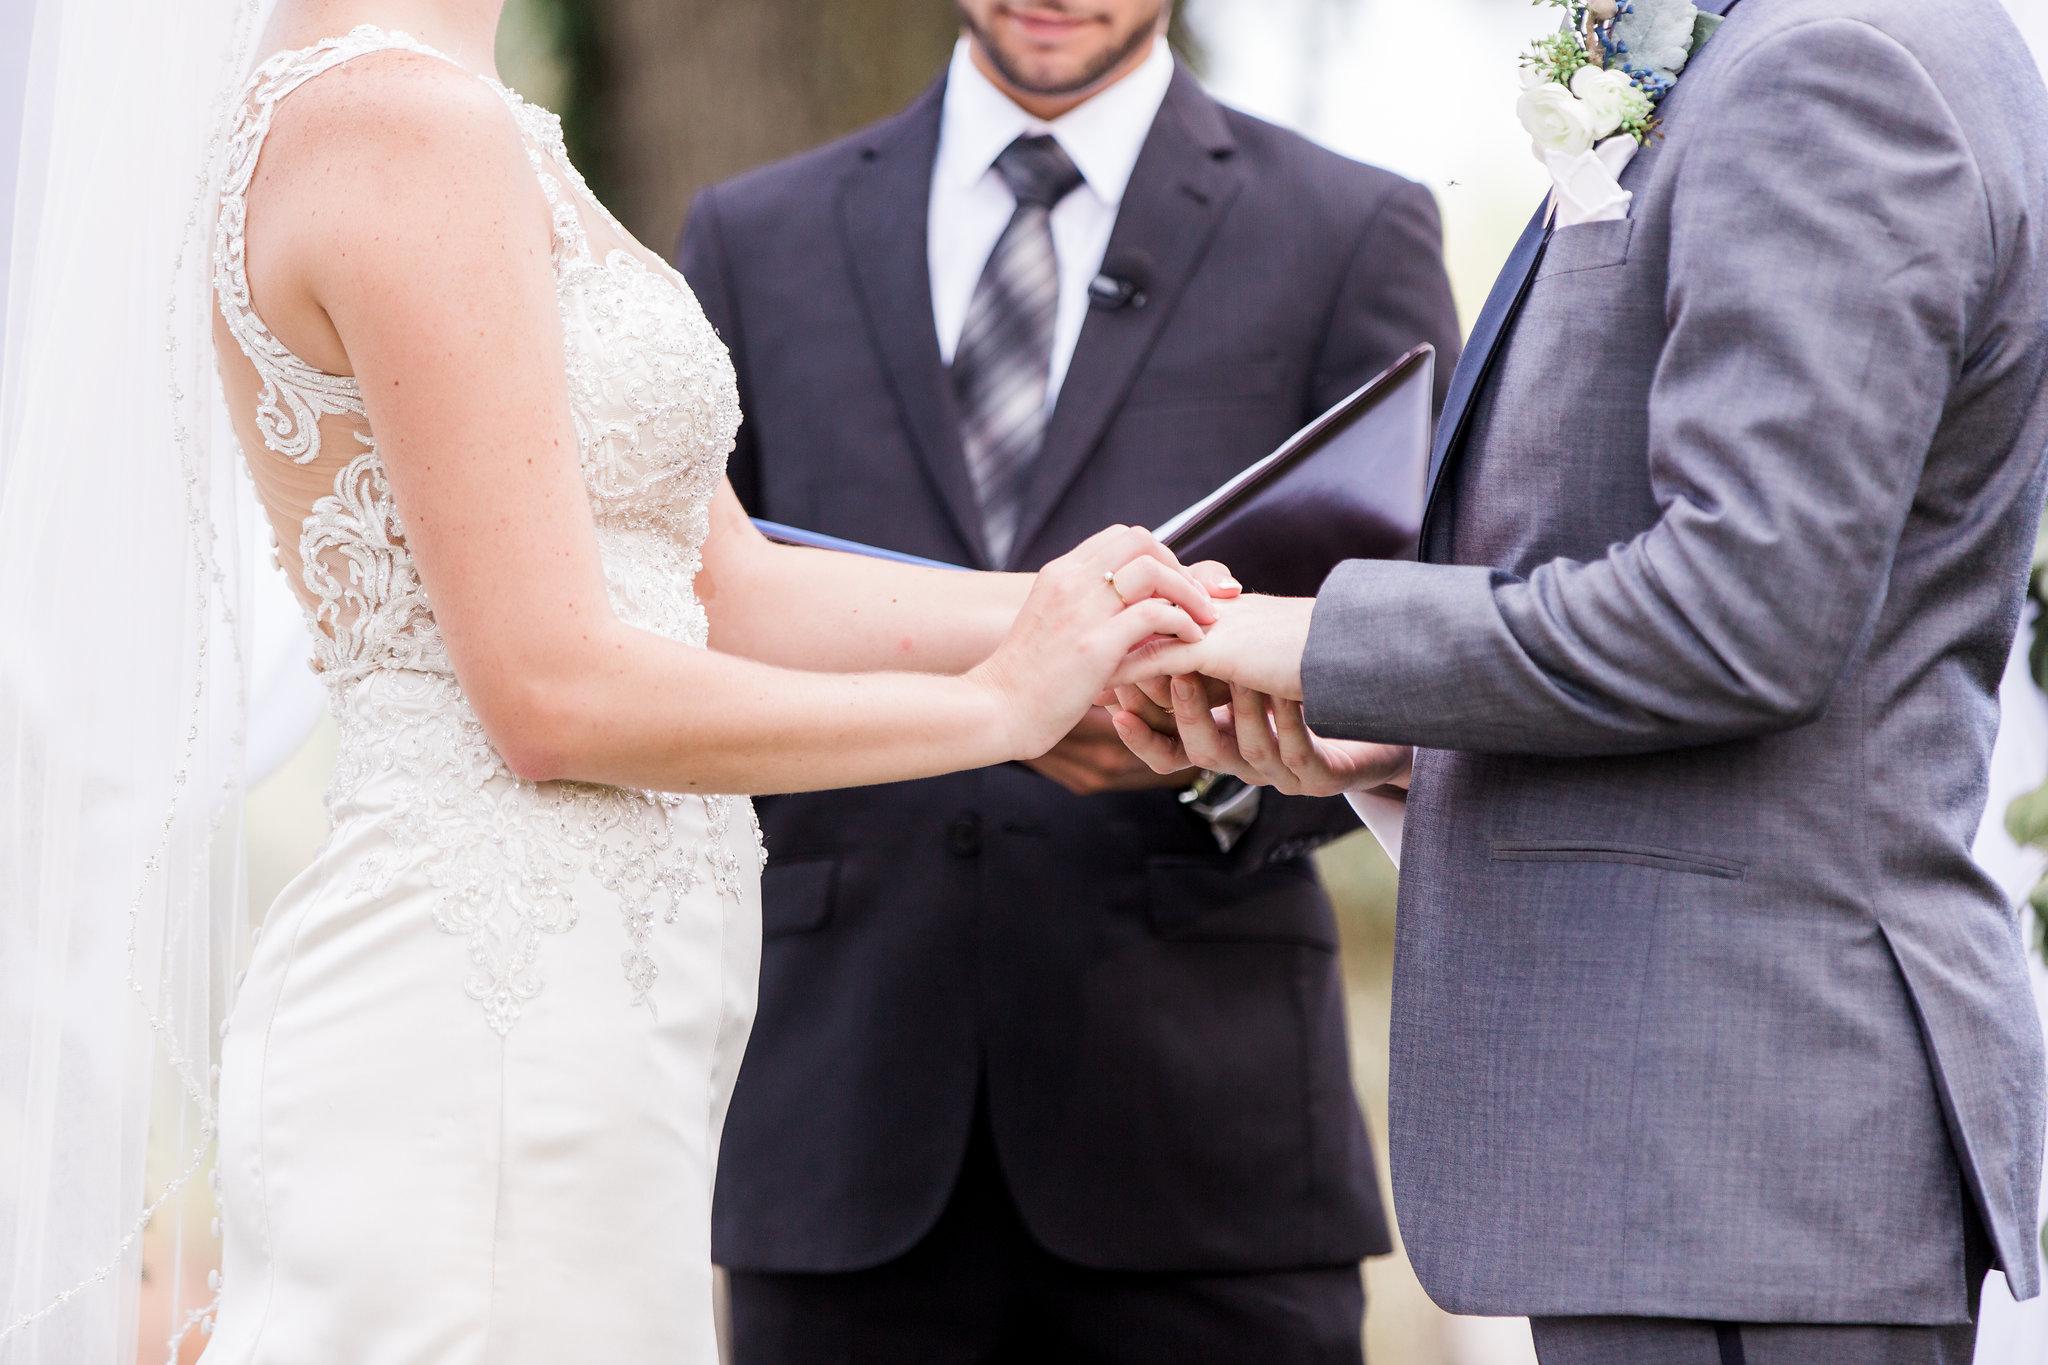 apt-b-photography-lauren-graham-oldfield-wedding-south-carolina-wedding-photographer-savannah-wedding-lowcountry-wedding-coastal-wedding-navy-wedding-plantation-wedding-27.JPG